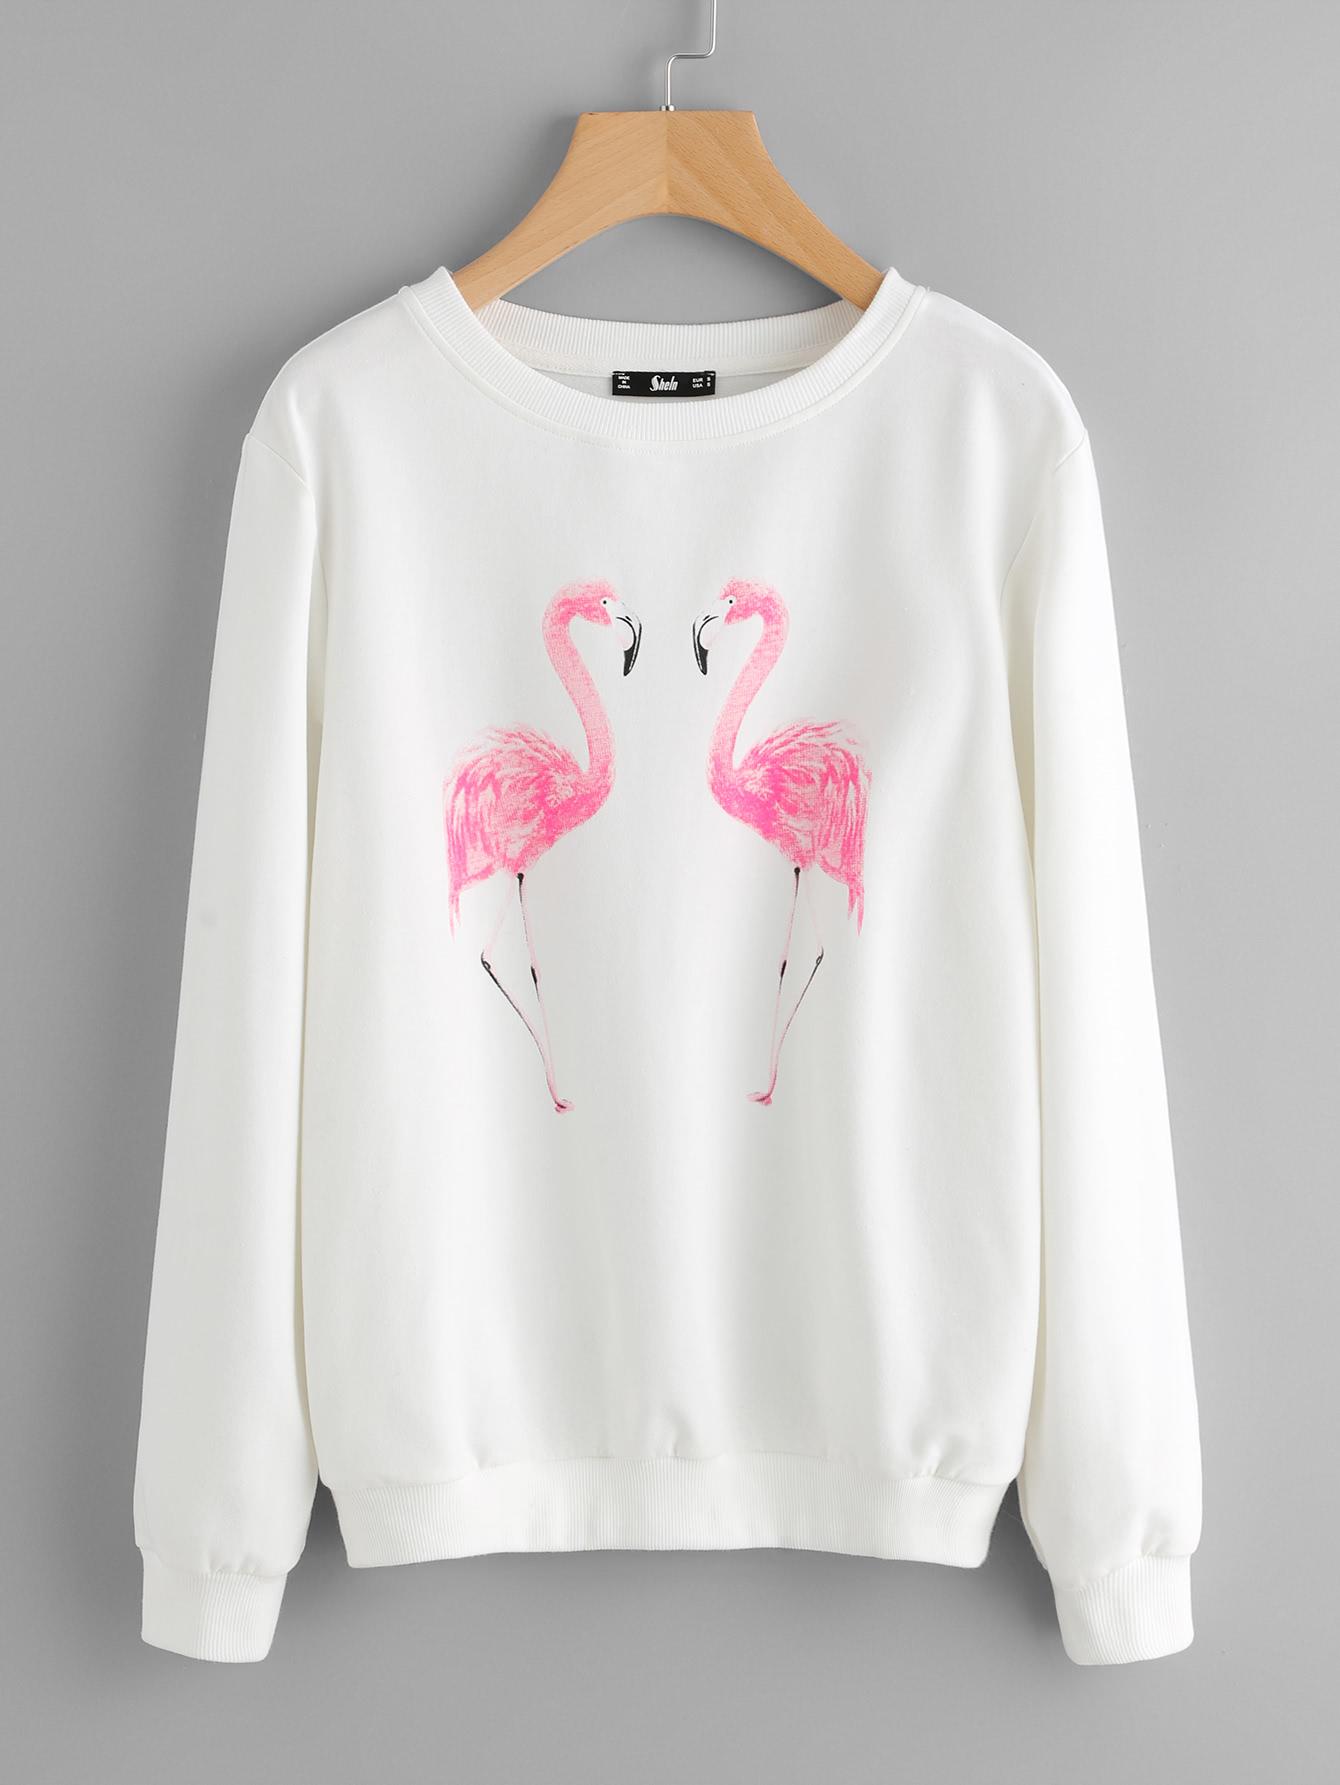 Свитшот с фламинго | Shein